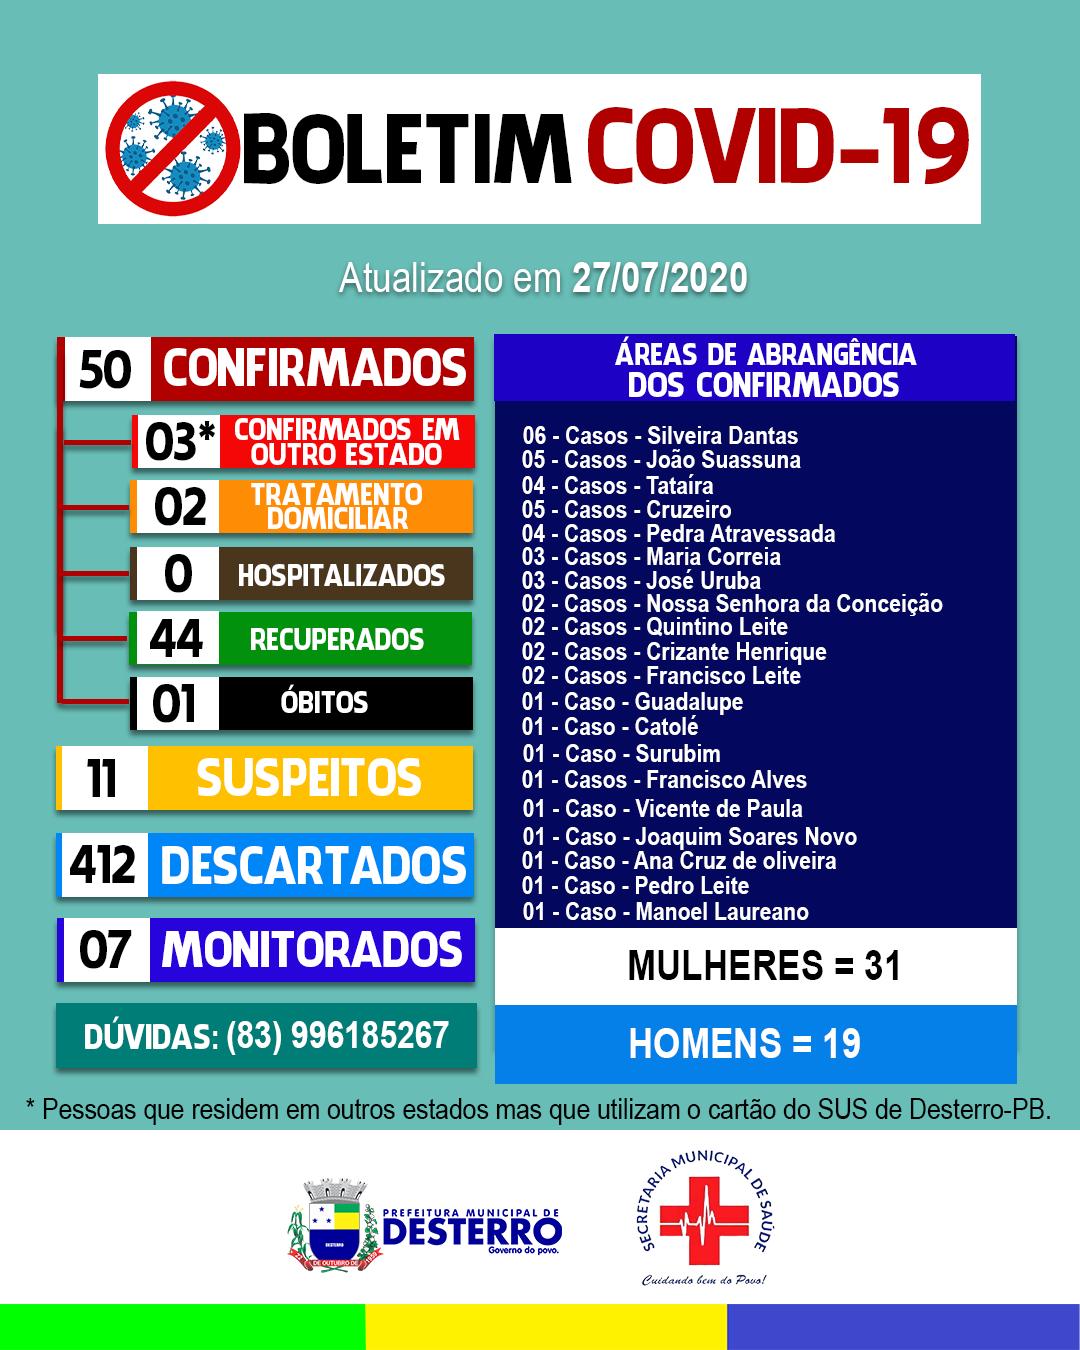 Boletim Covid-19 (27/07/2020)